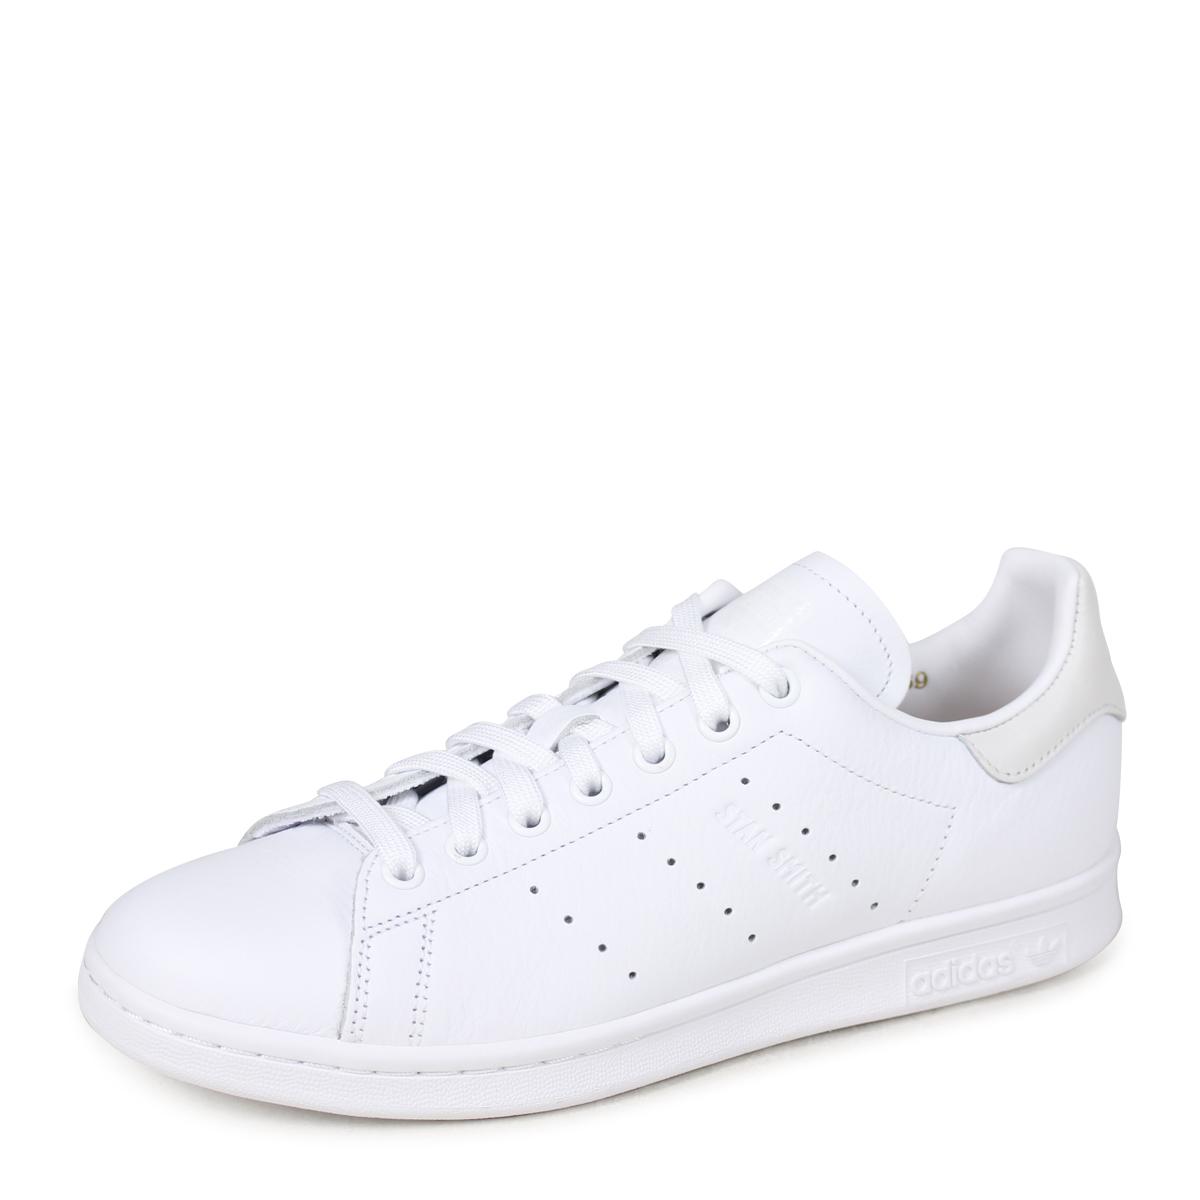 adidas Originals STAN SMITH Adidas